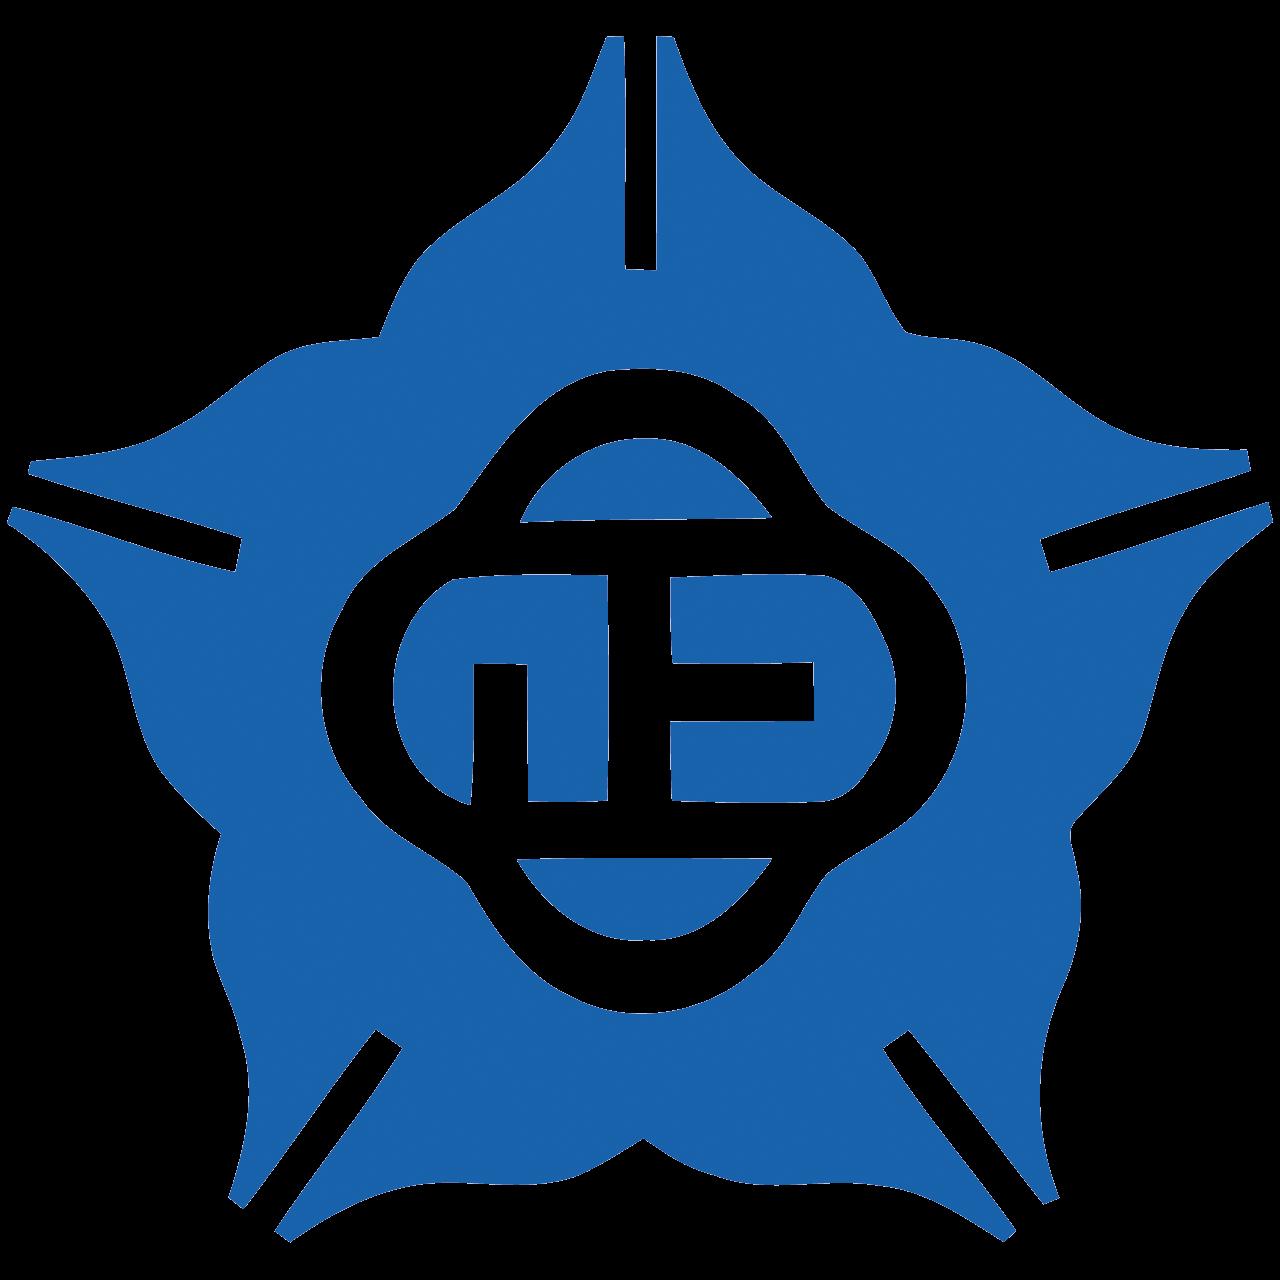 Taiwan National Chung Cheng University logo